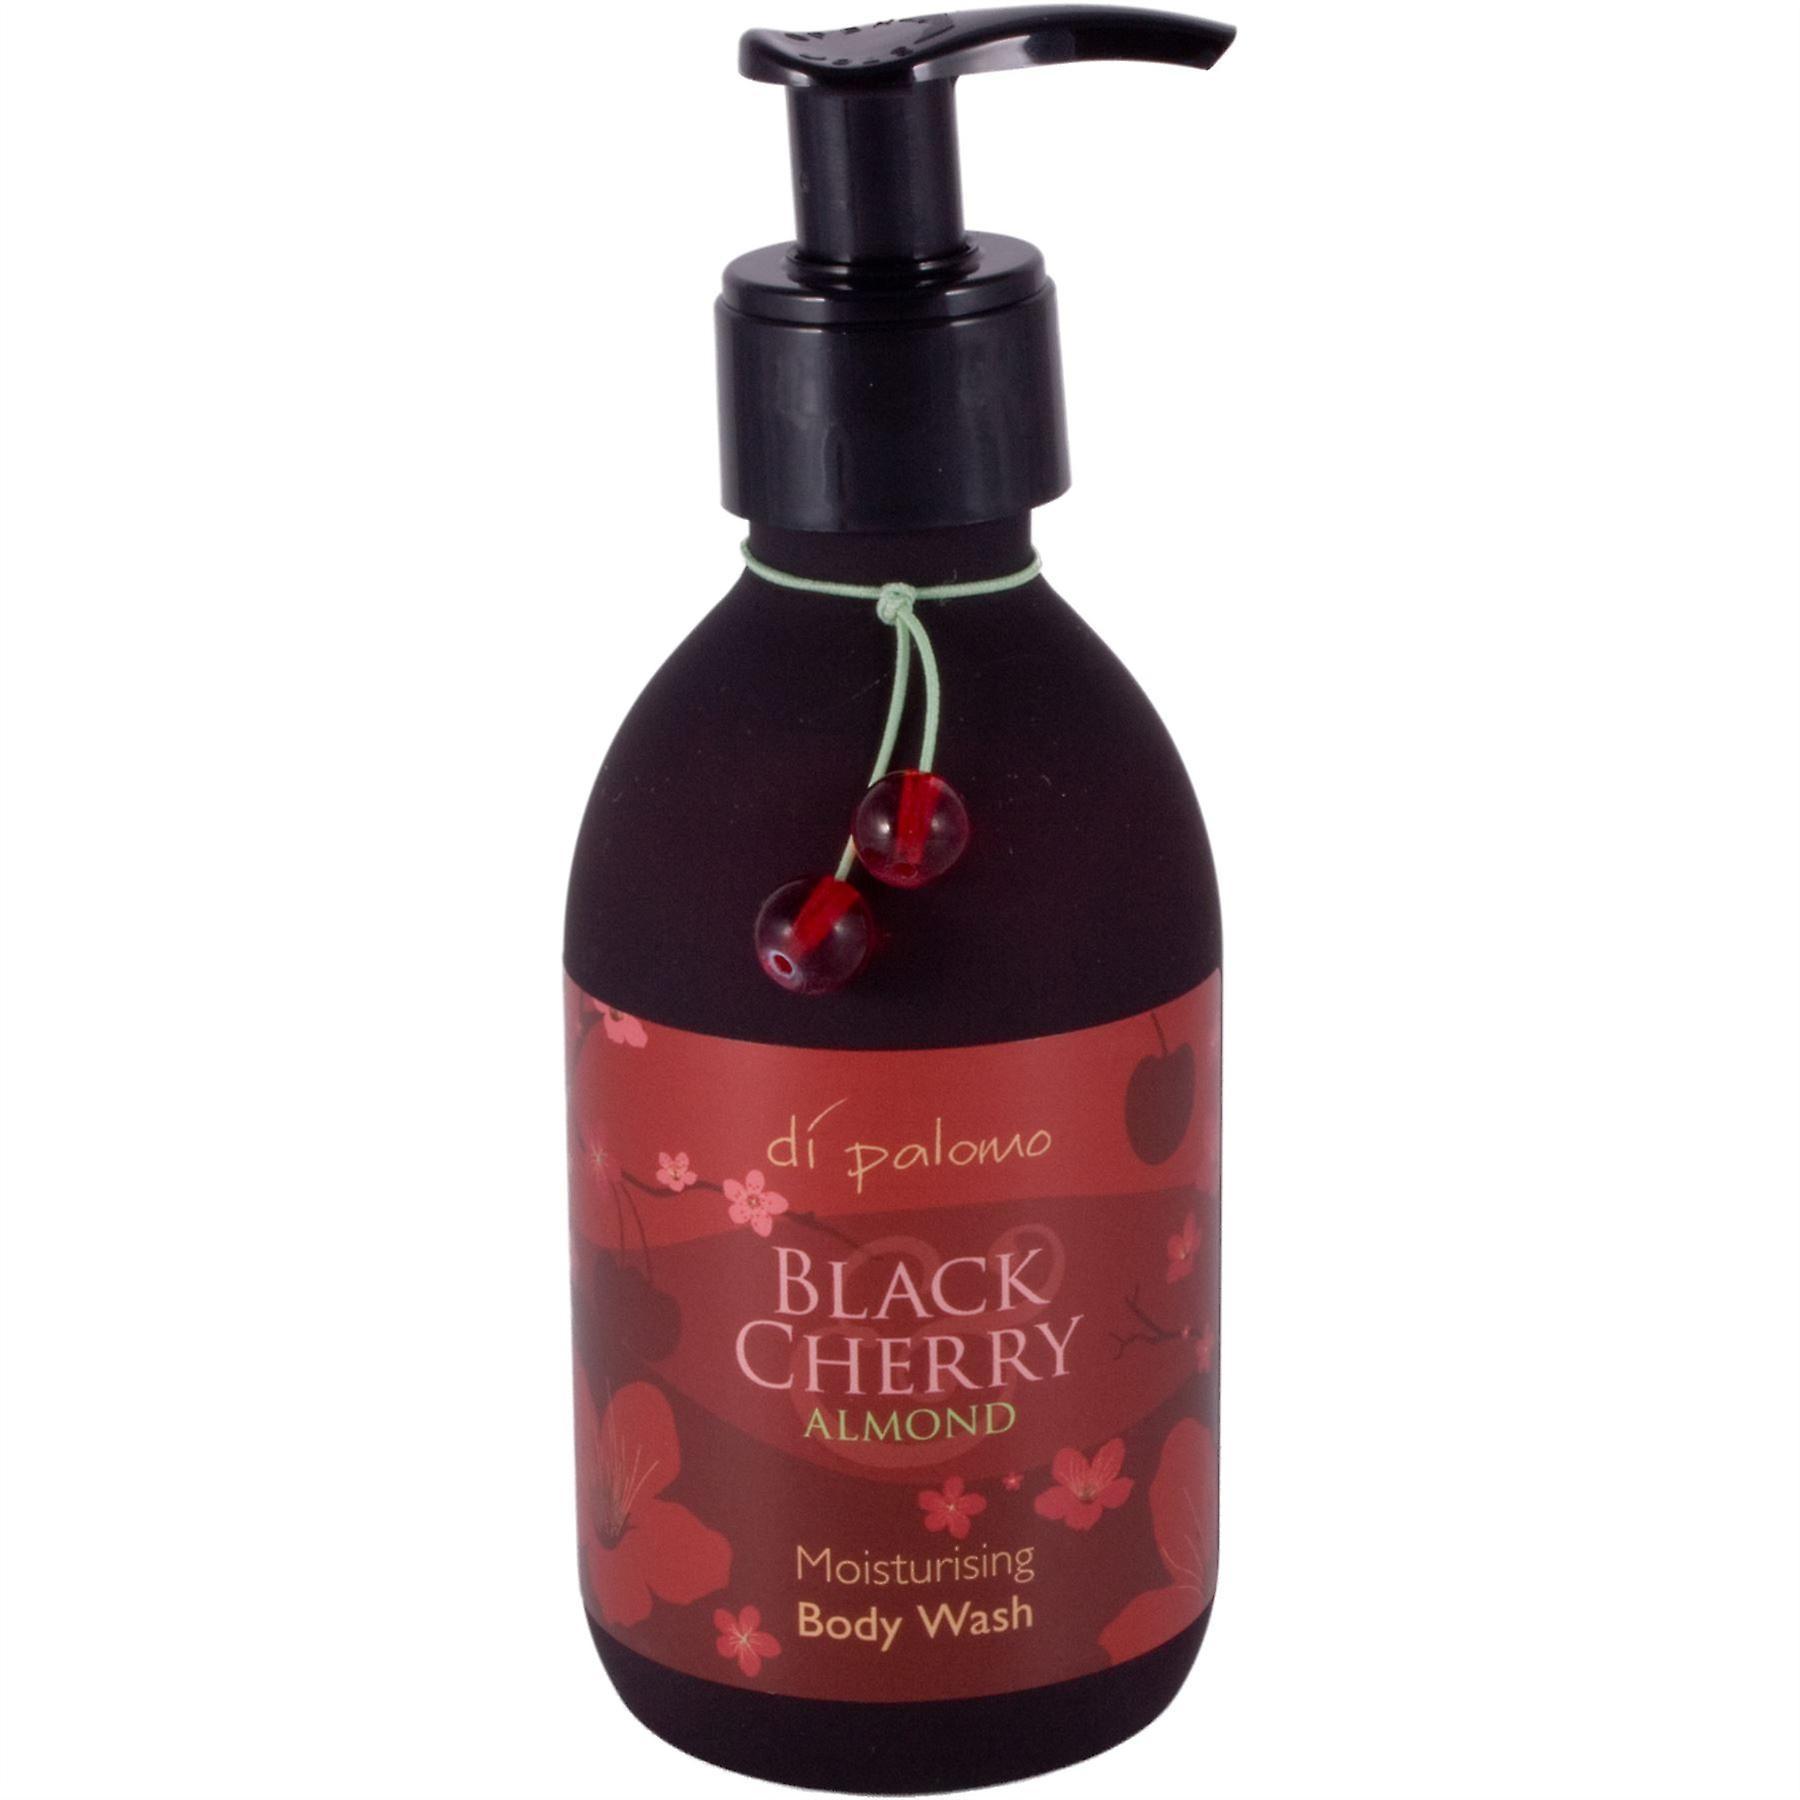 Di Palomo Luxury Moisturising Shower Gel Body Wash 225ml - Black Cherry and Almond